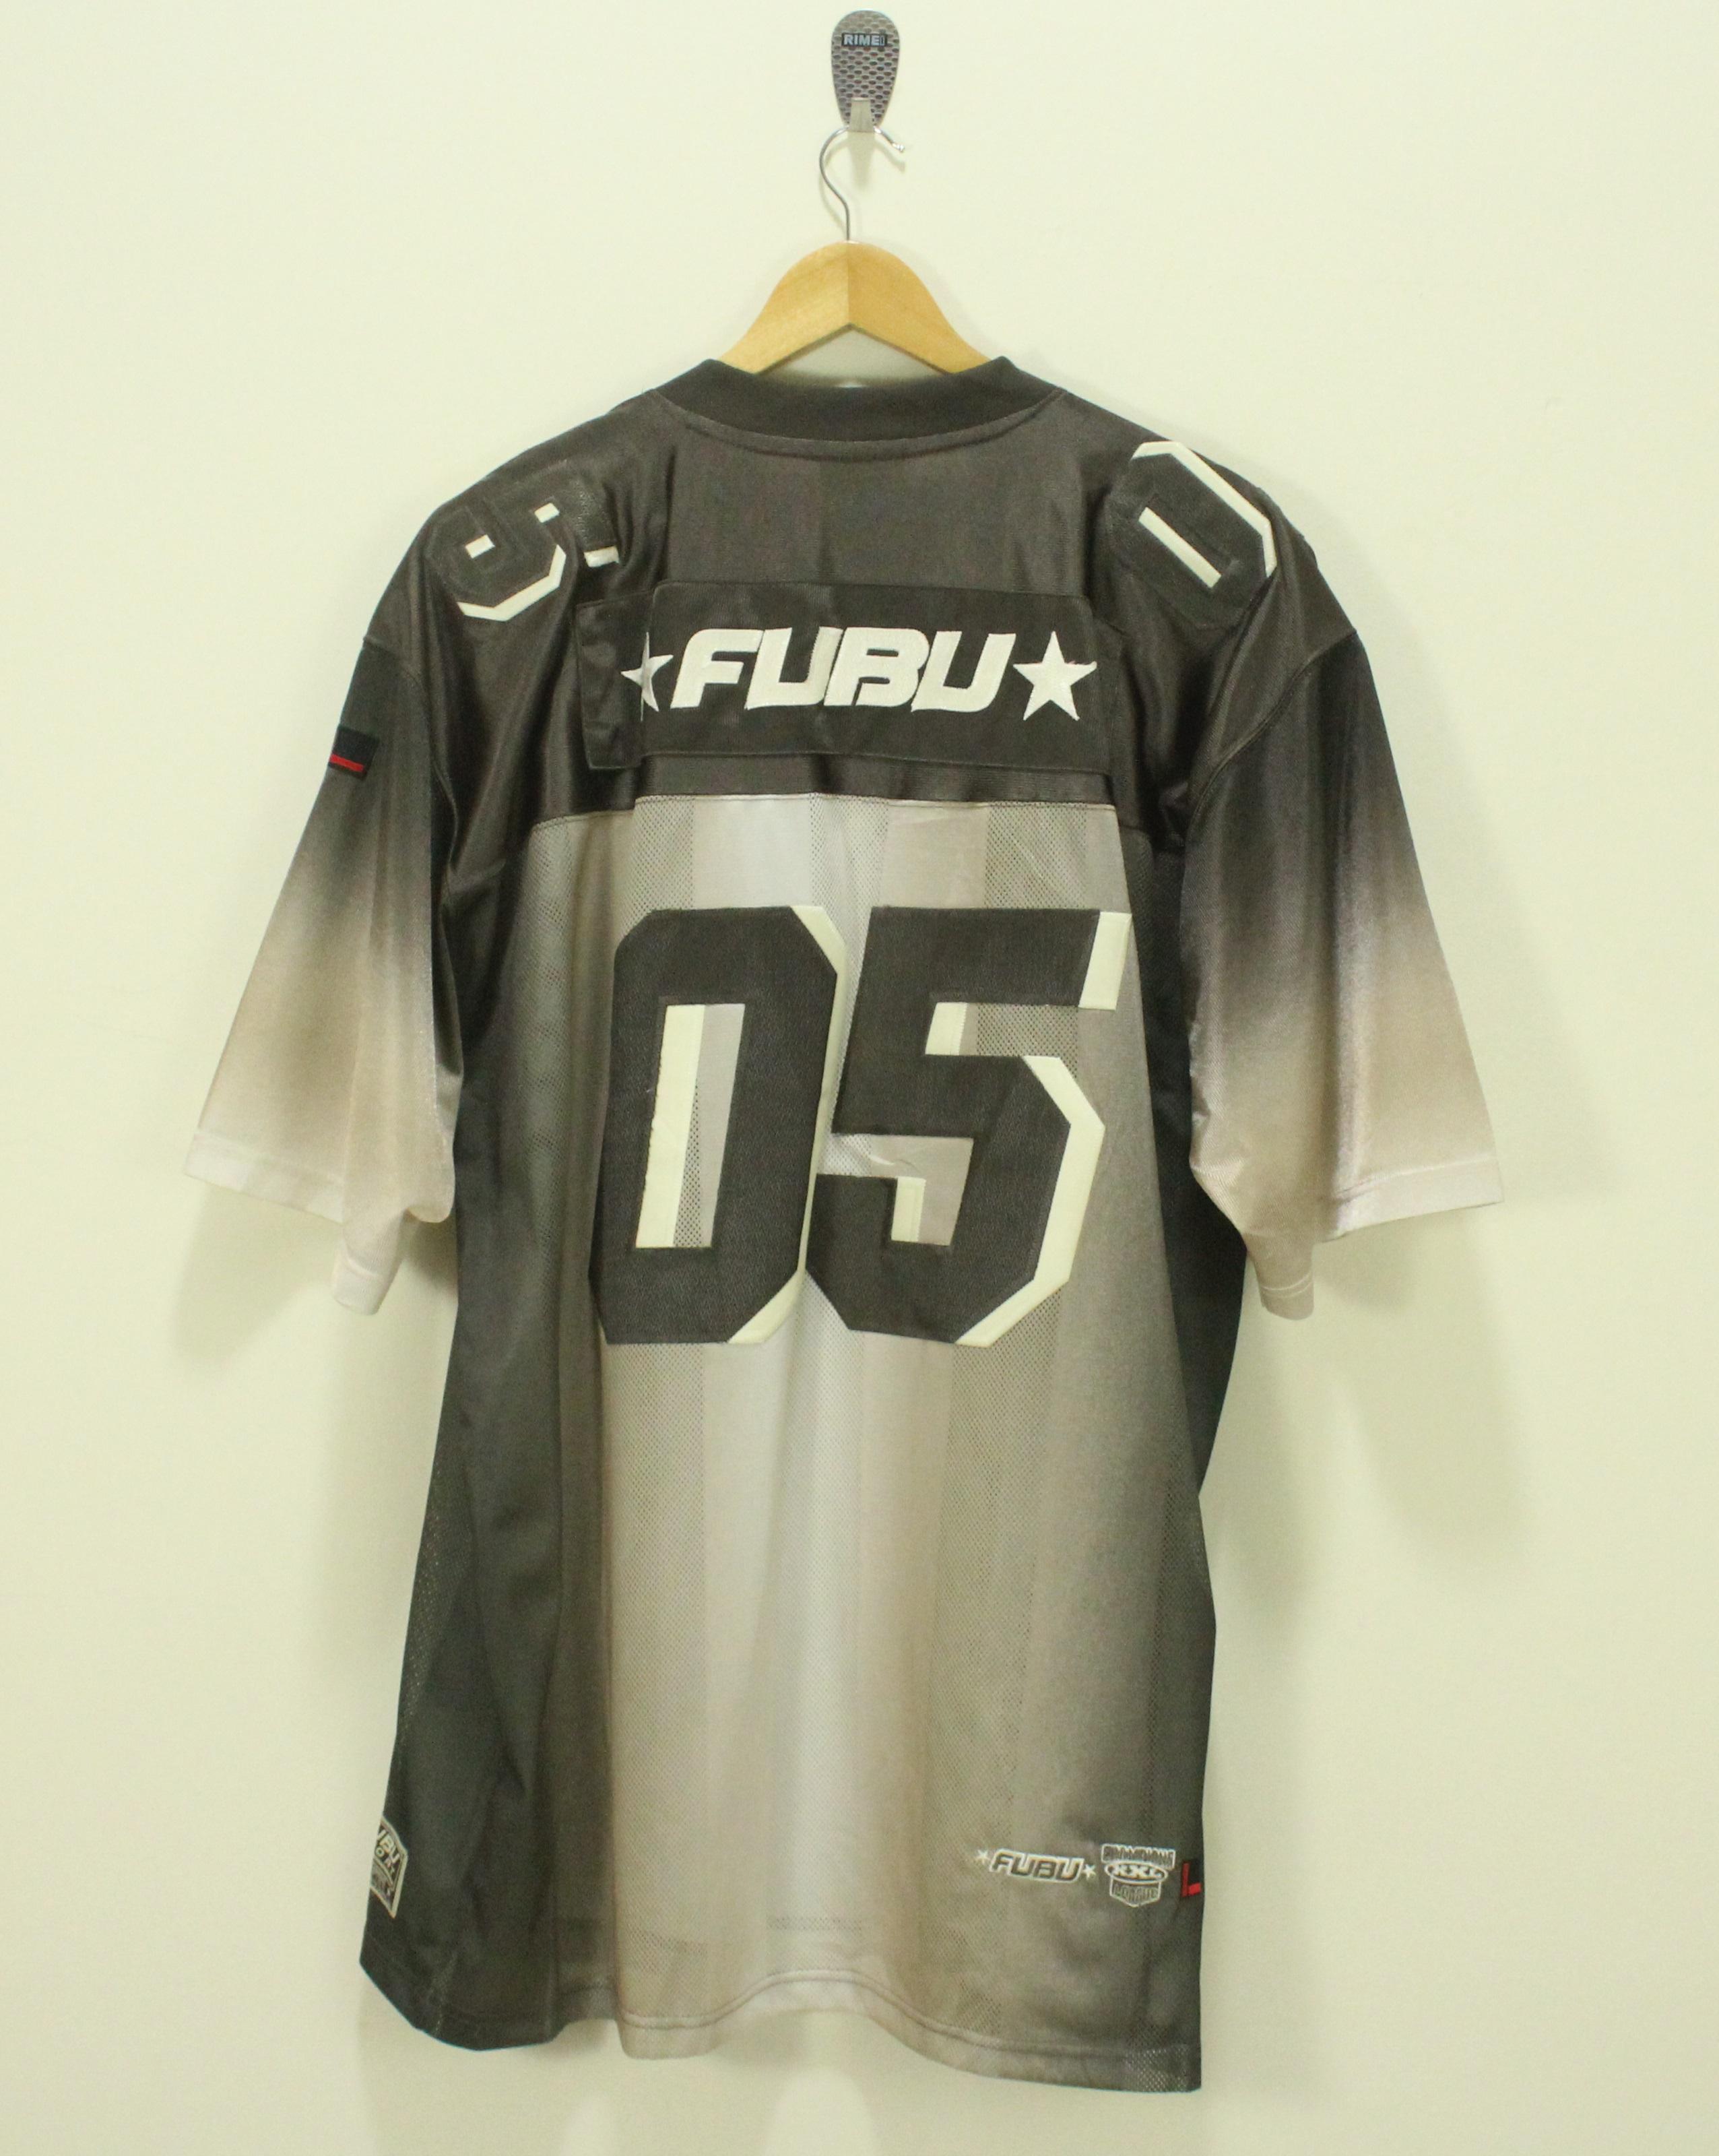 Fubu FUBU T Shirt Jersey 05 Mesh Striped Hip Hop Swag Jay Z